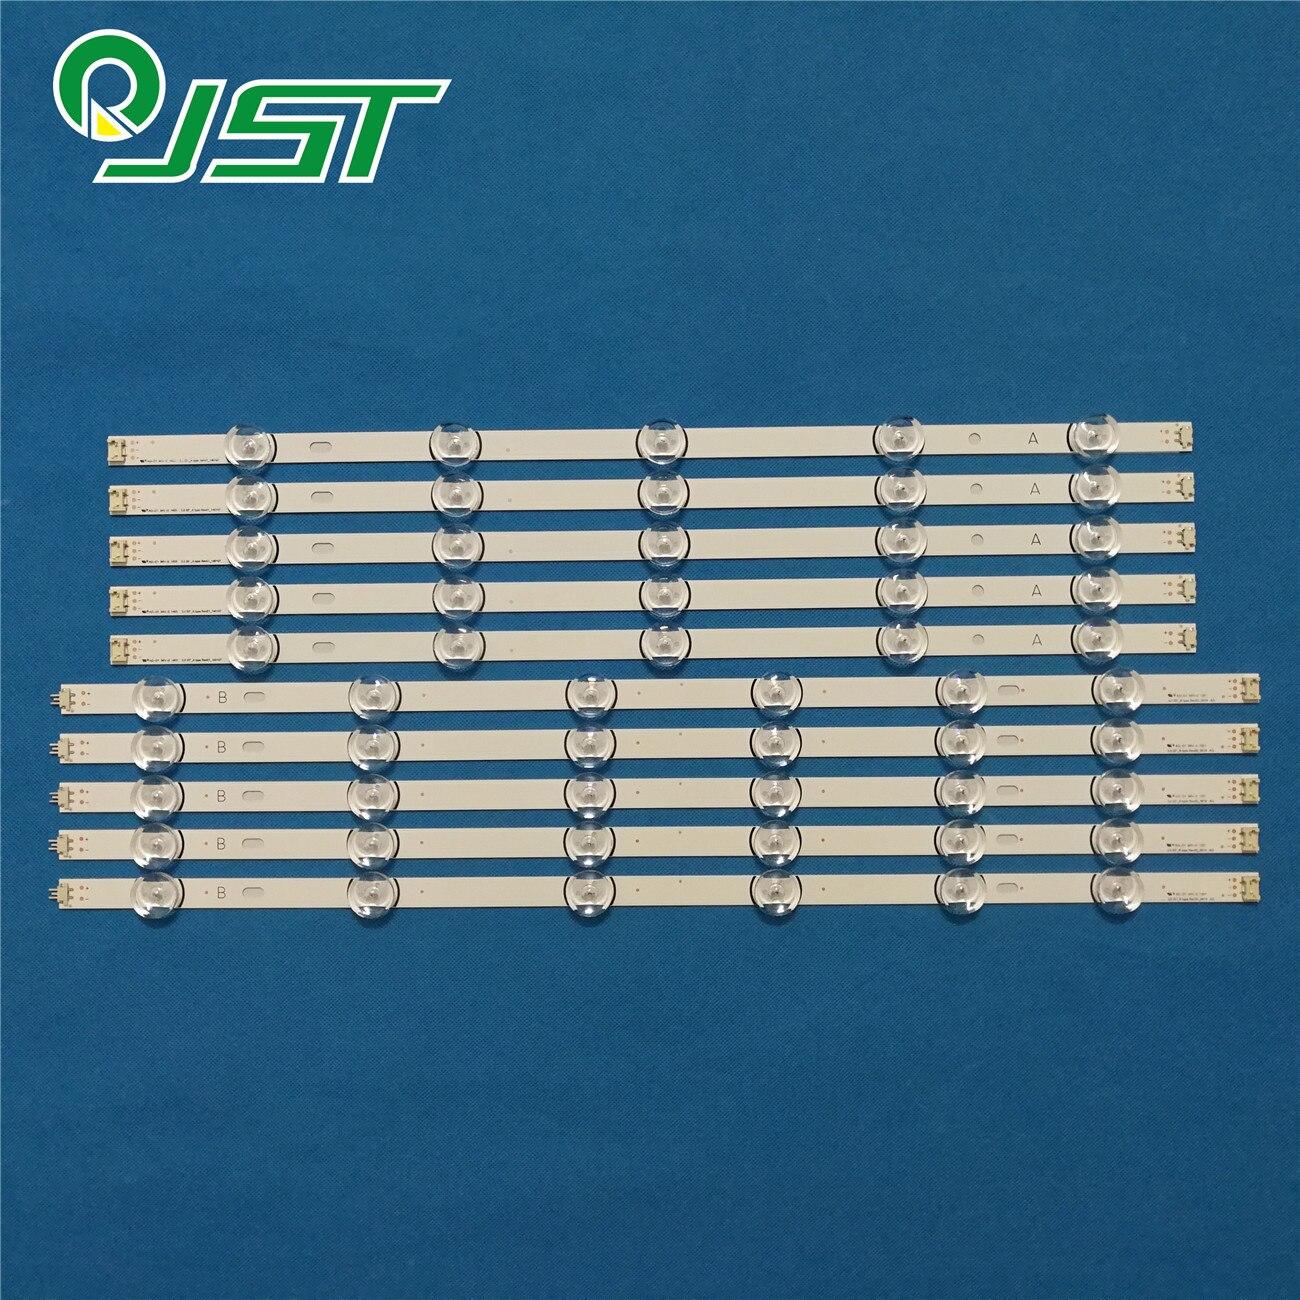 100% New 30pcs=3Kits LED strips for L G TV 55LB5670 CR 55LB570V ZB 55LB570U ZK AGF78401601 LC550DUE FGM4 6916L 1987A 6916L 1988A